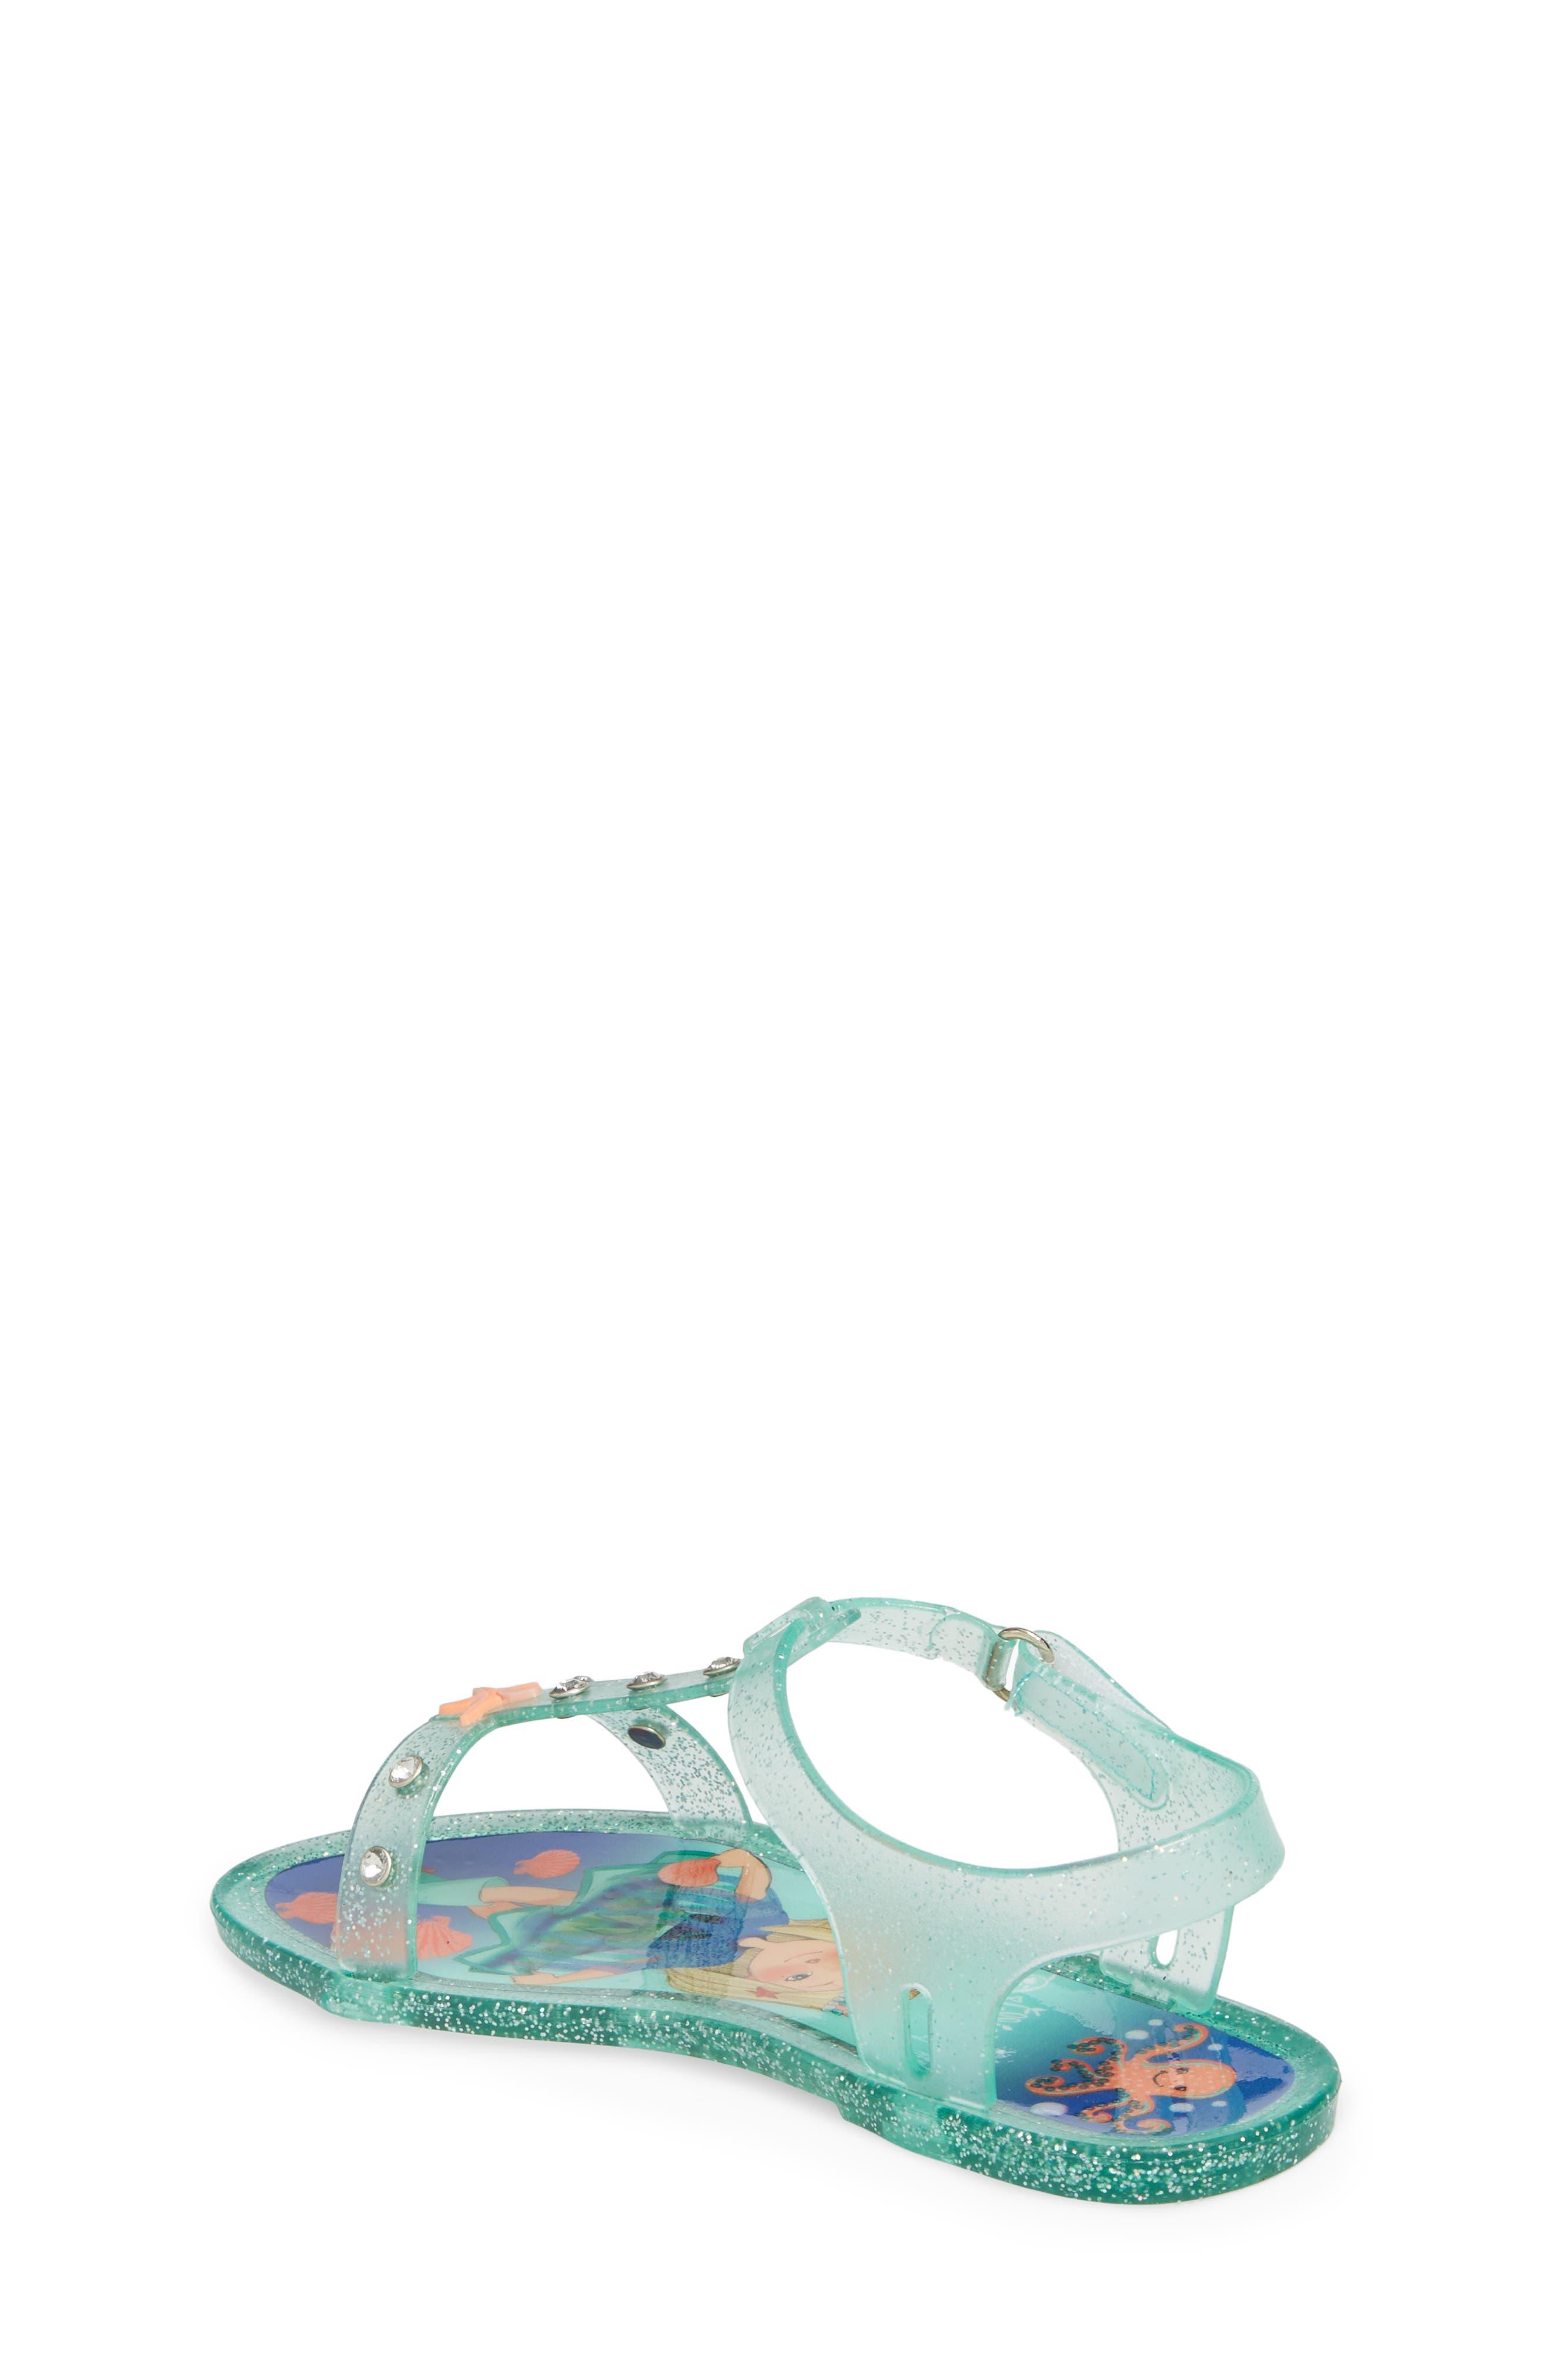 Camille Glitter Jelly Sandal,                             Alternate thumbnail 2, color,                             Beach Glass